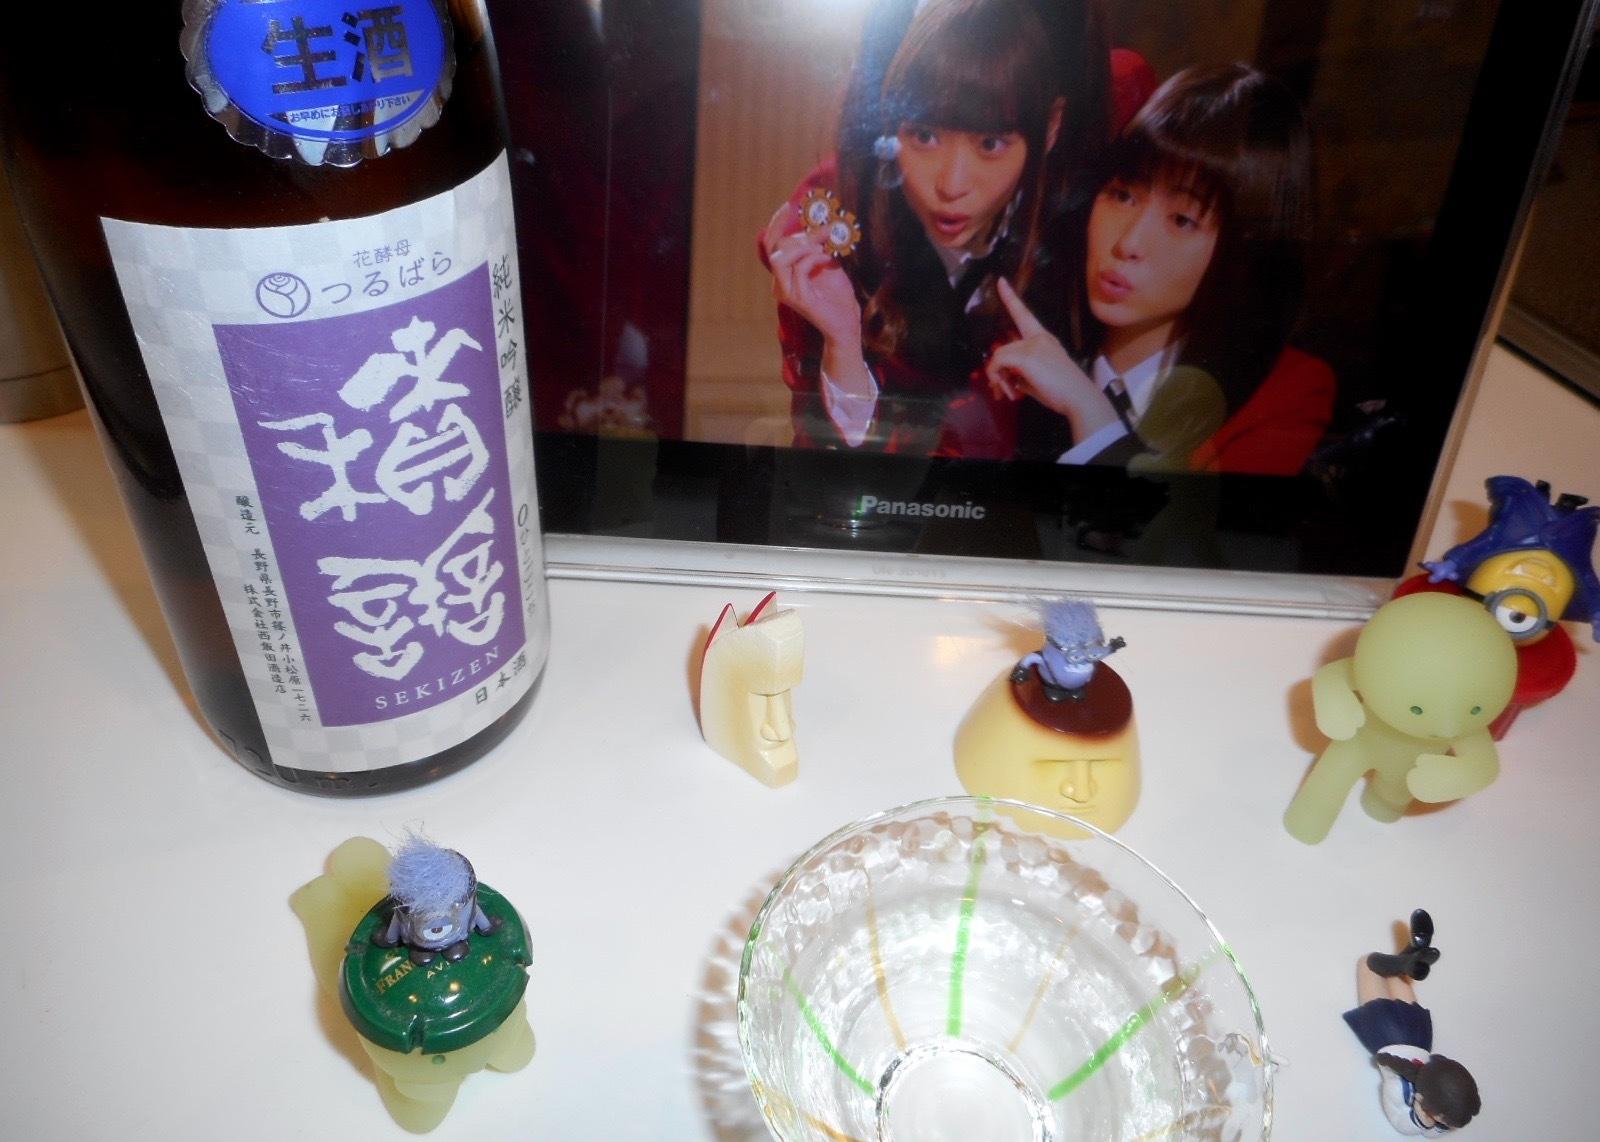 sekizen_jungin_tsurubara29by3.jpg